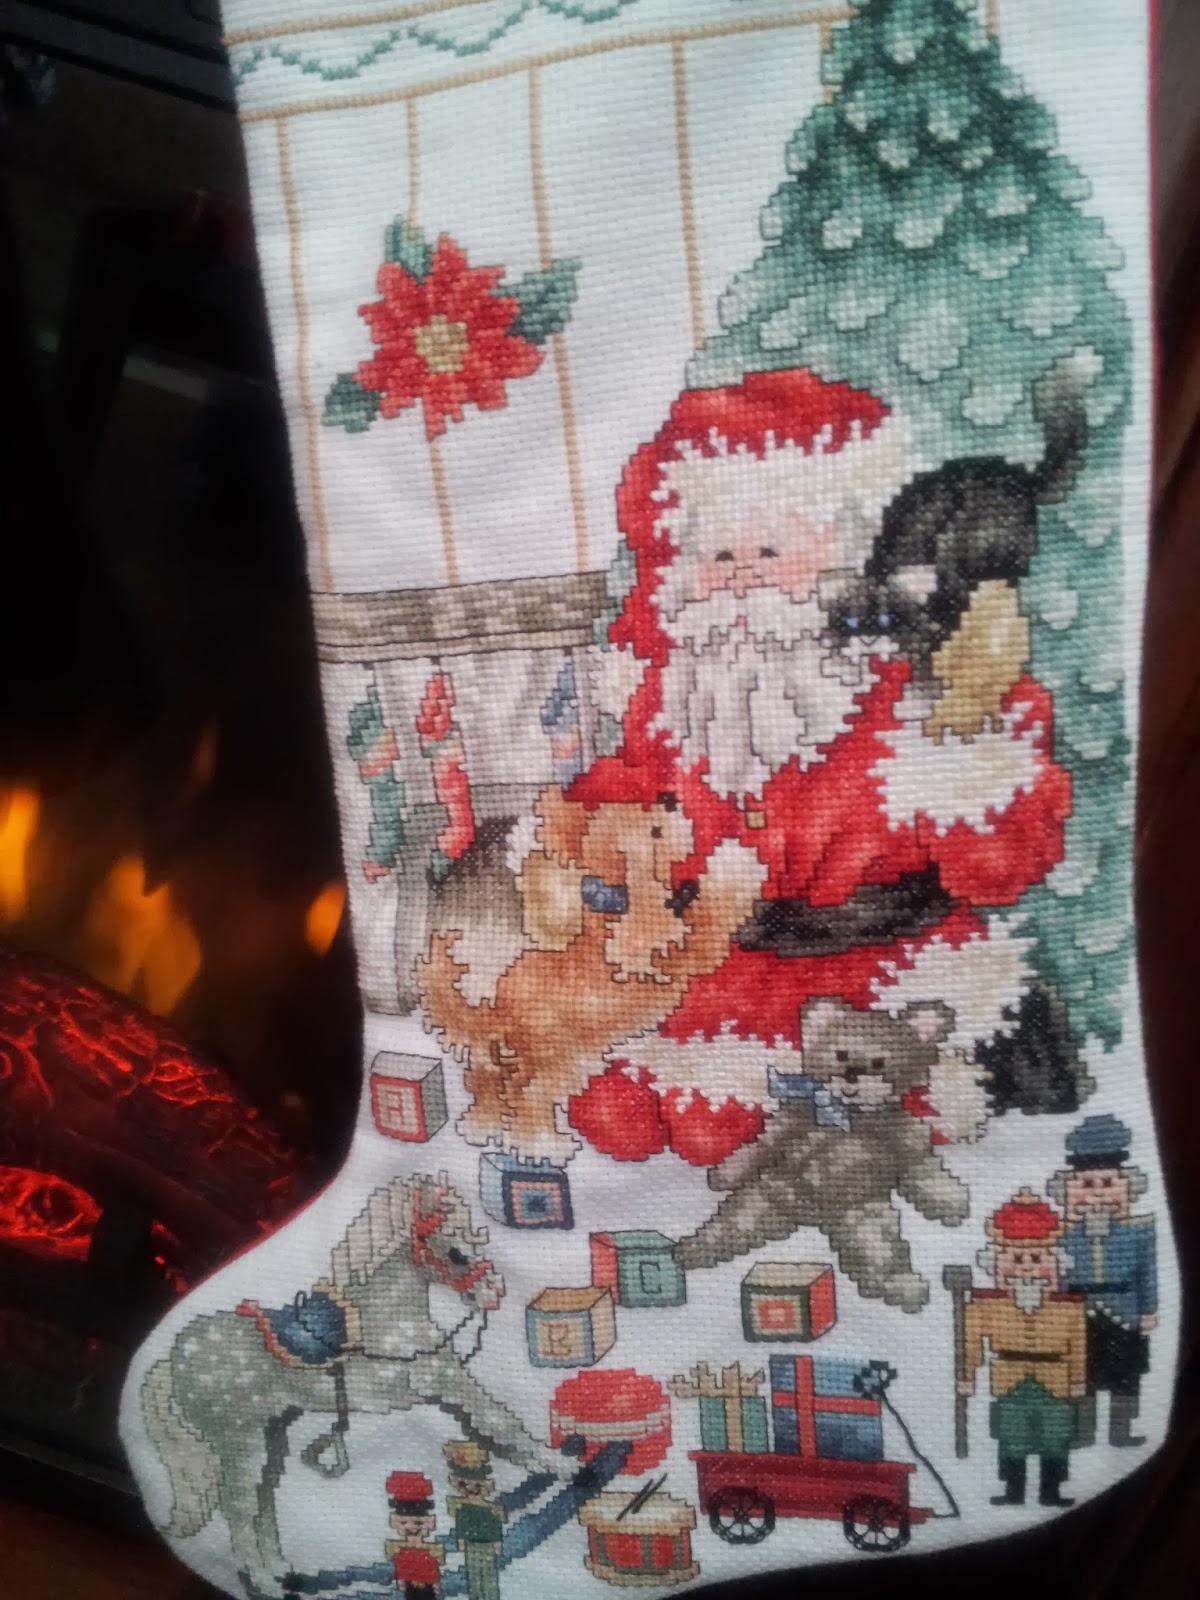 cross-stitch, embroidery, Christmas, kids, fireplace, Santa